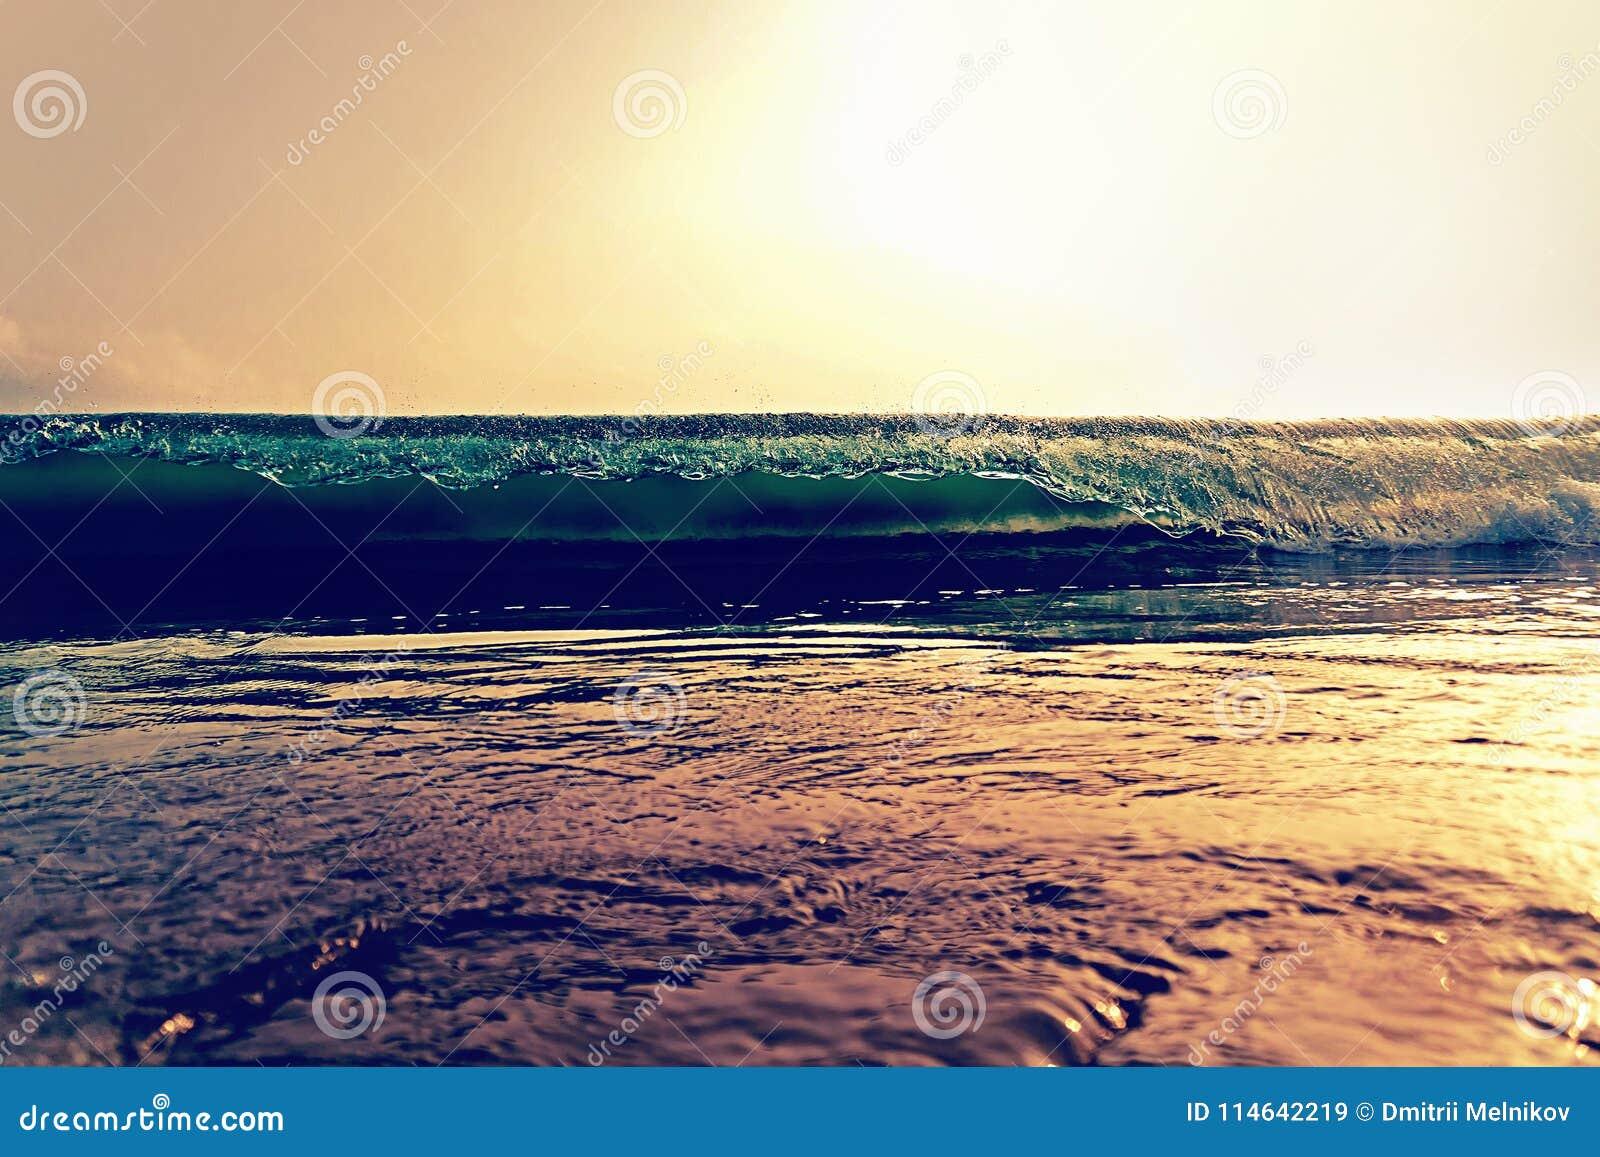 Ominous Ocean Wave